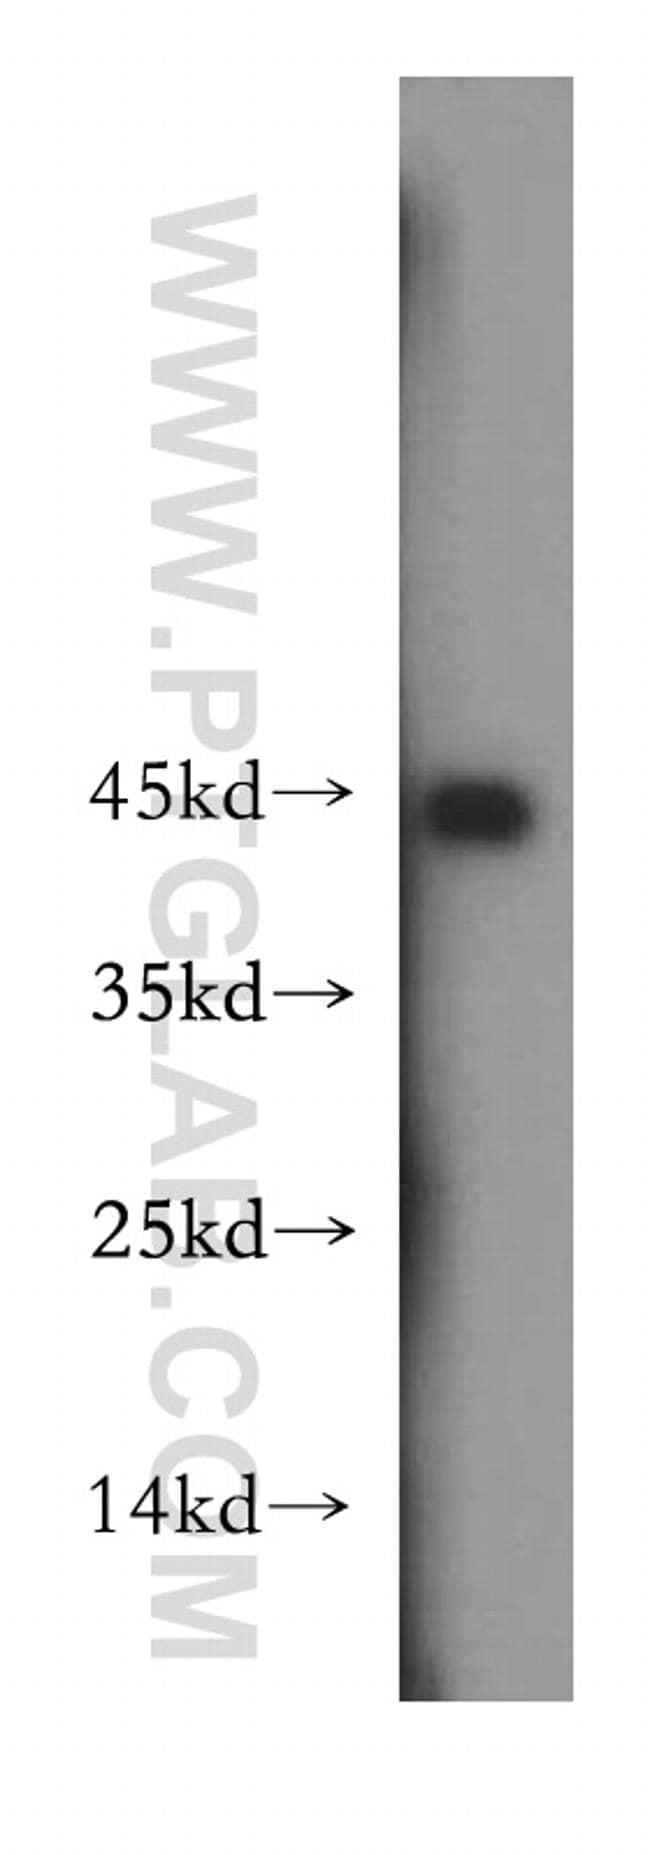 FKBPL Antibody in Western Blot (WB)